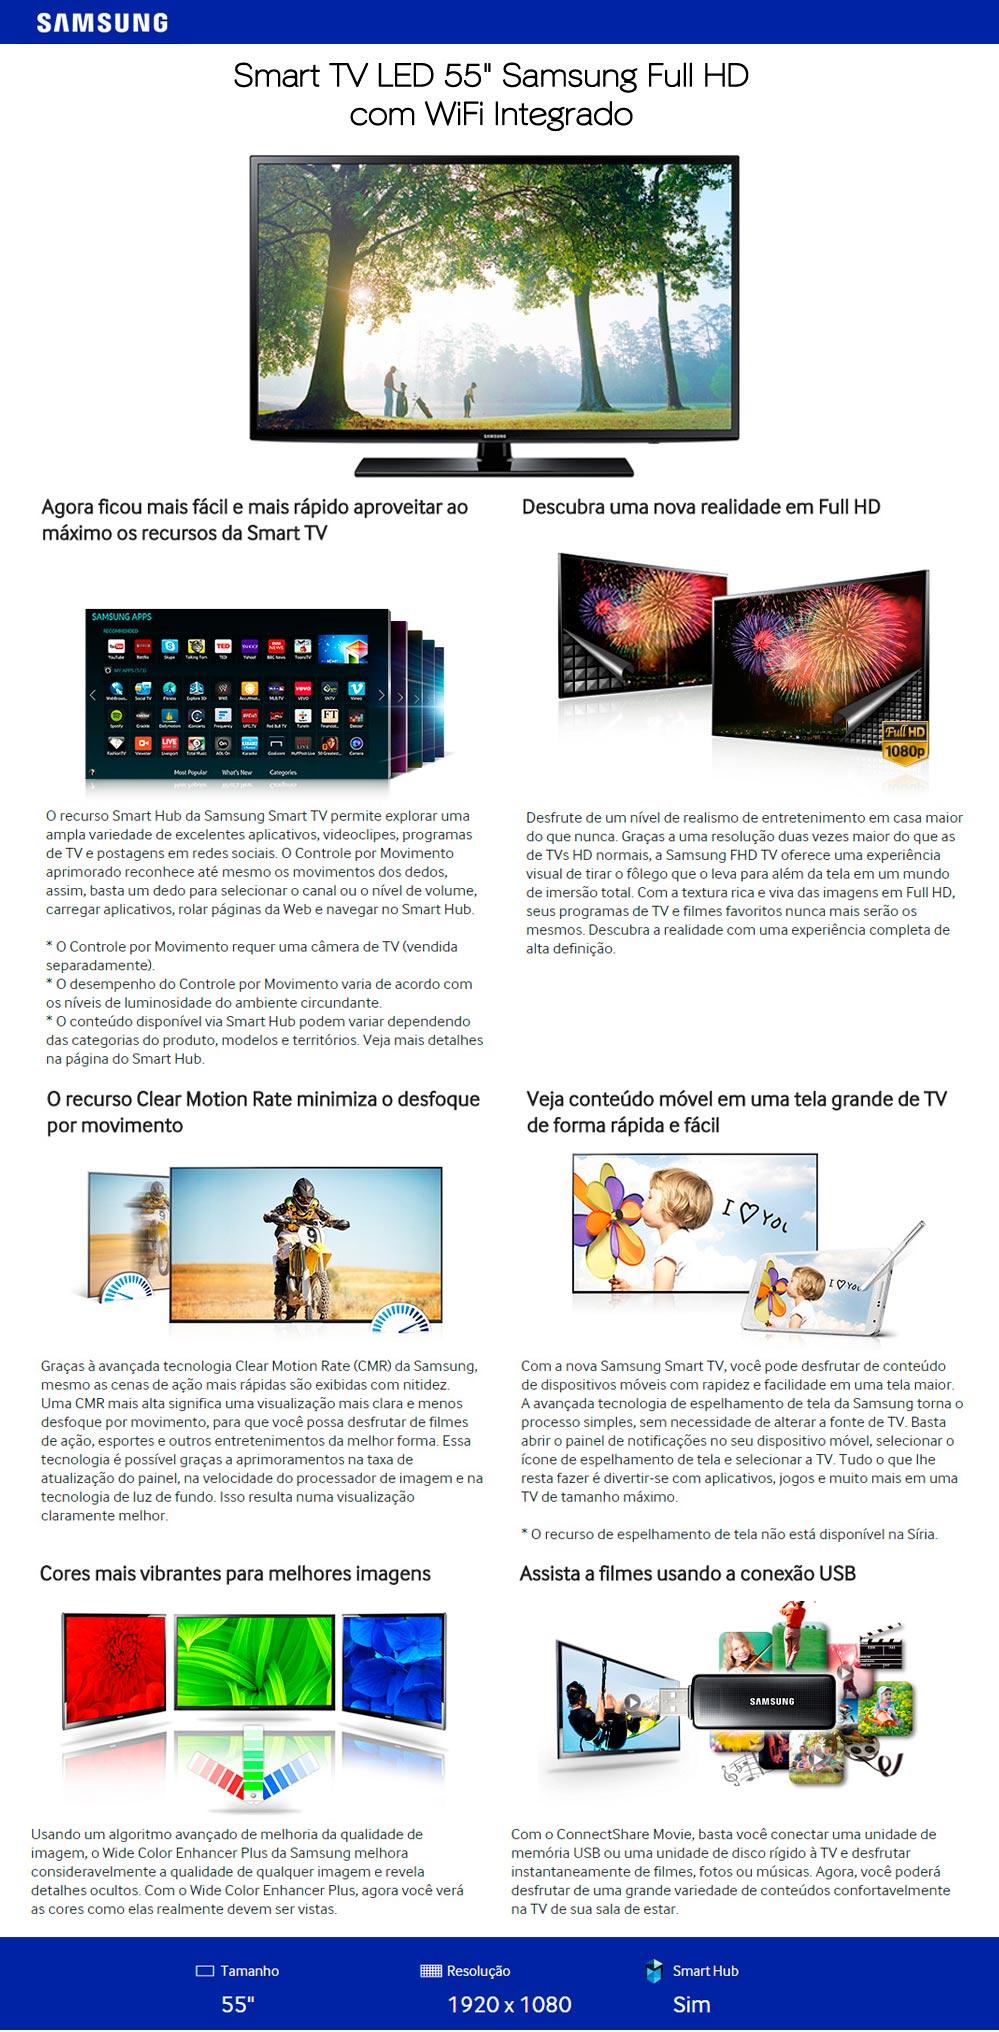 SMART TV 55 LED SAMSUNG FULL HD HDMI WIFI USB CONVERSOR DIGITAL